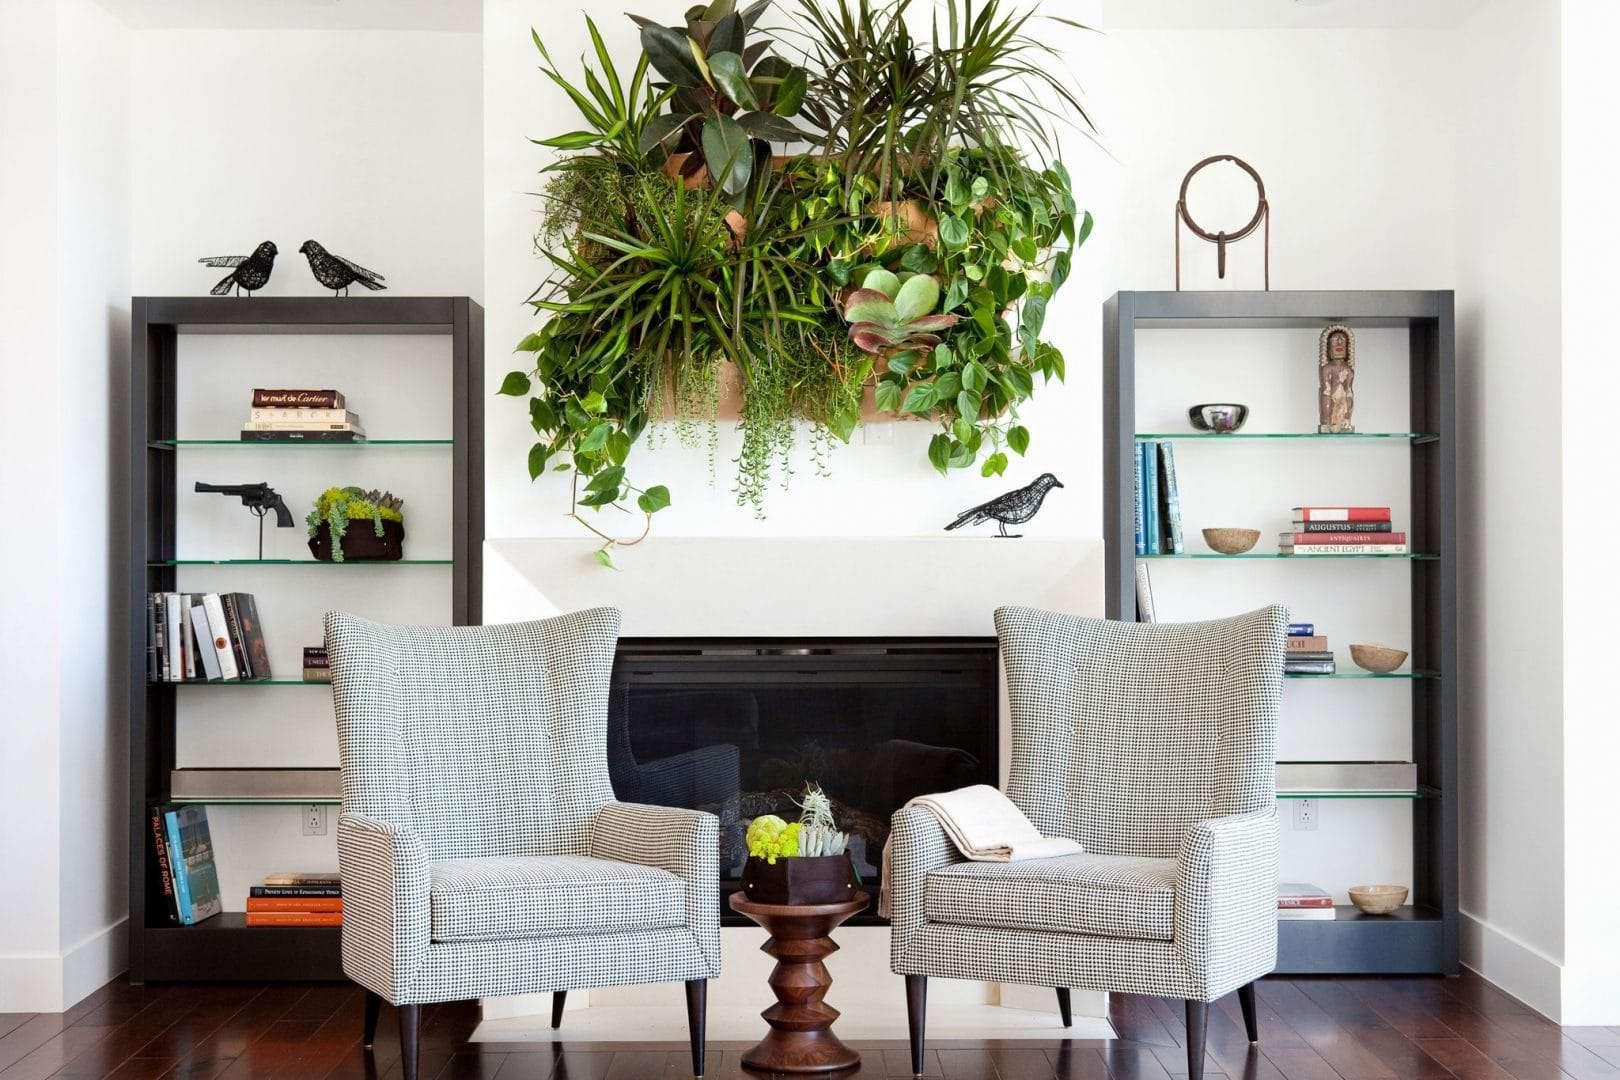 house plants hanging plants